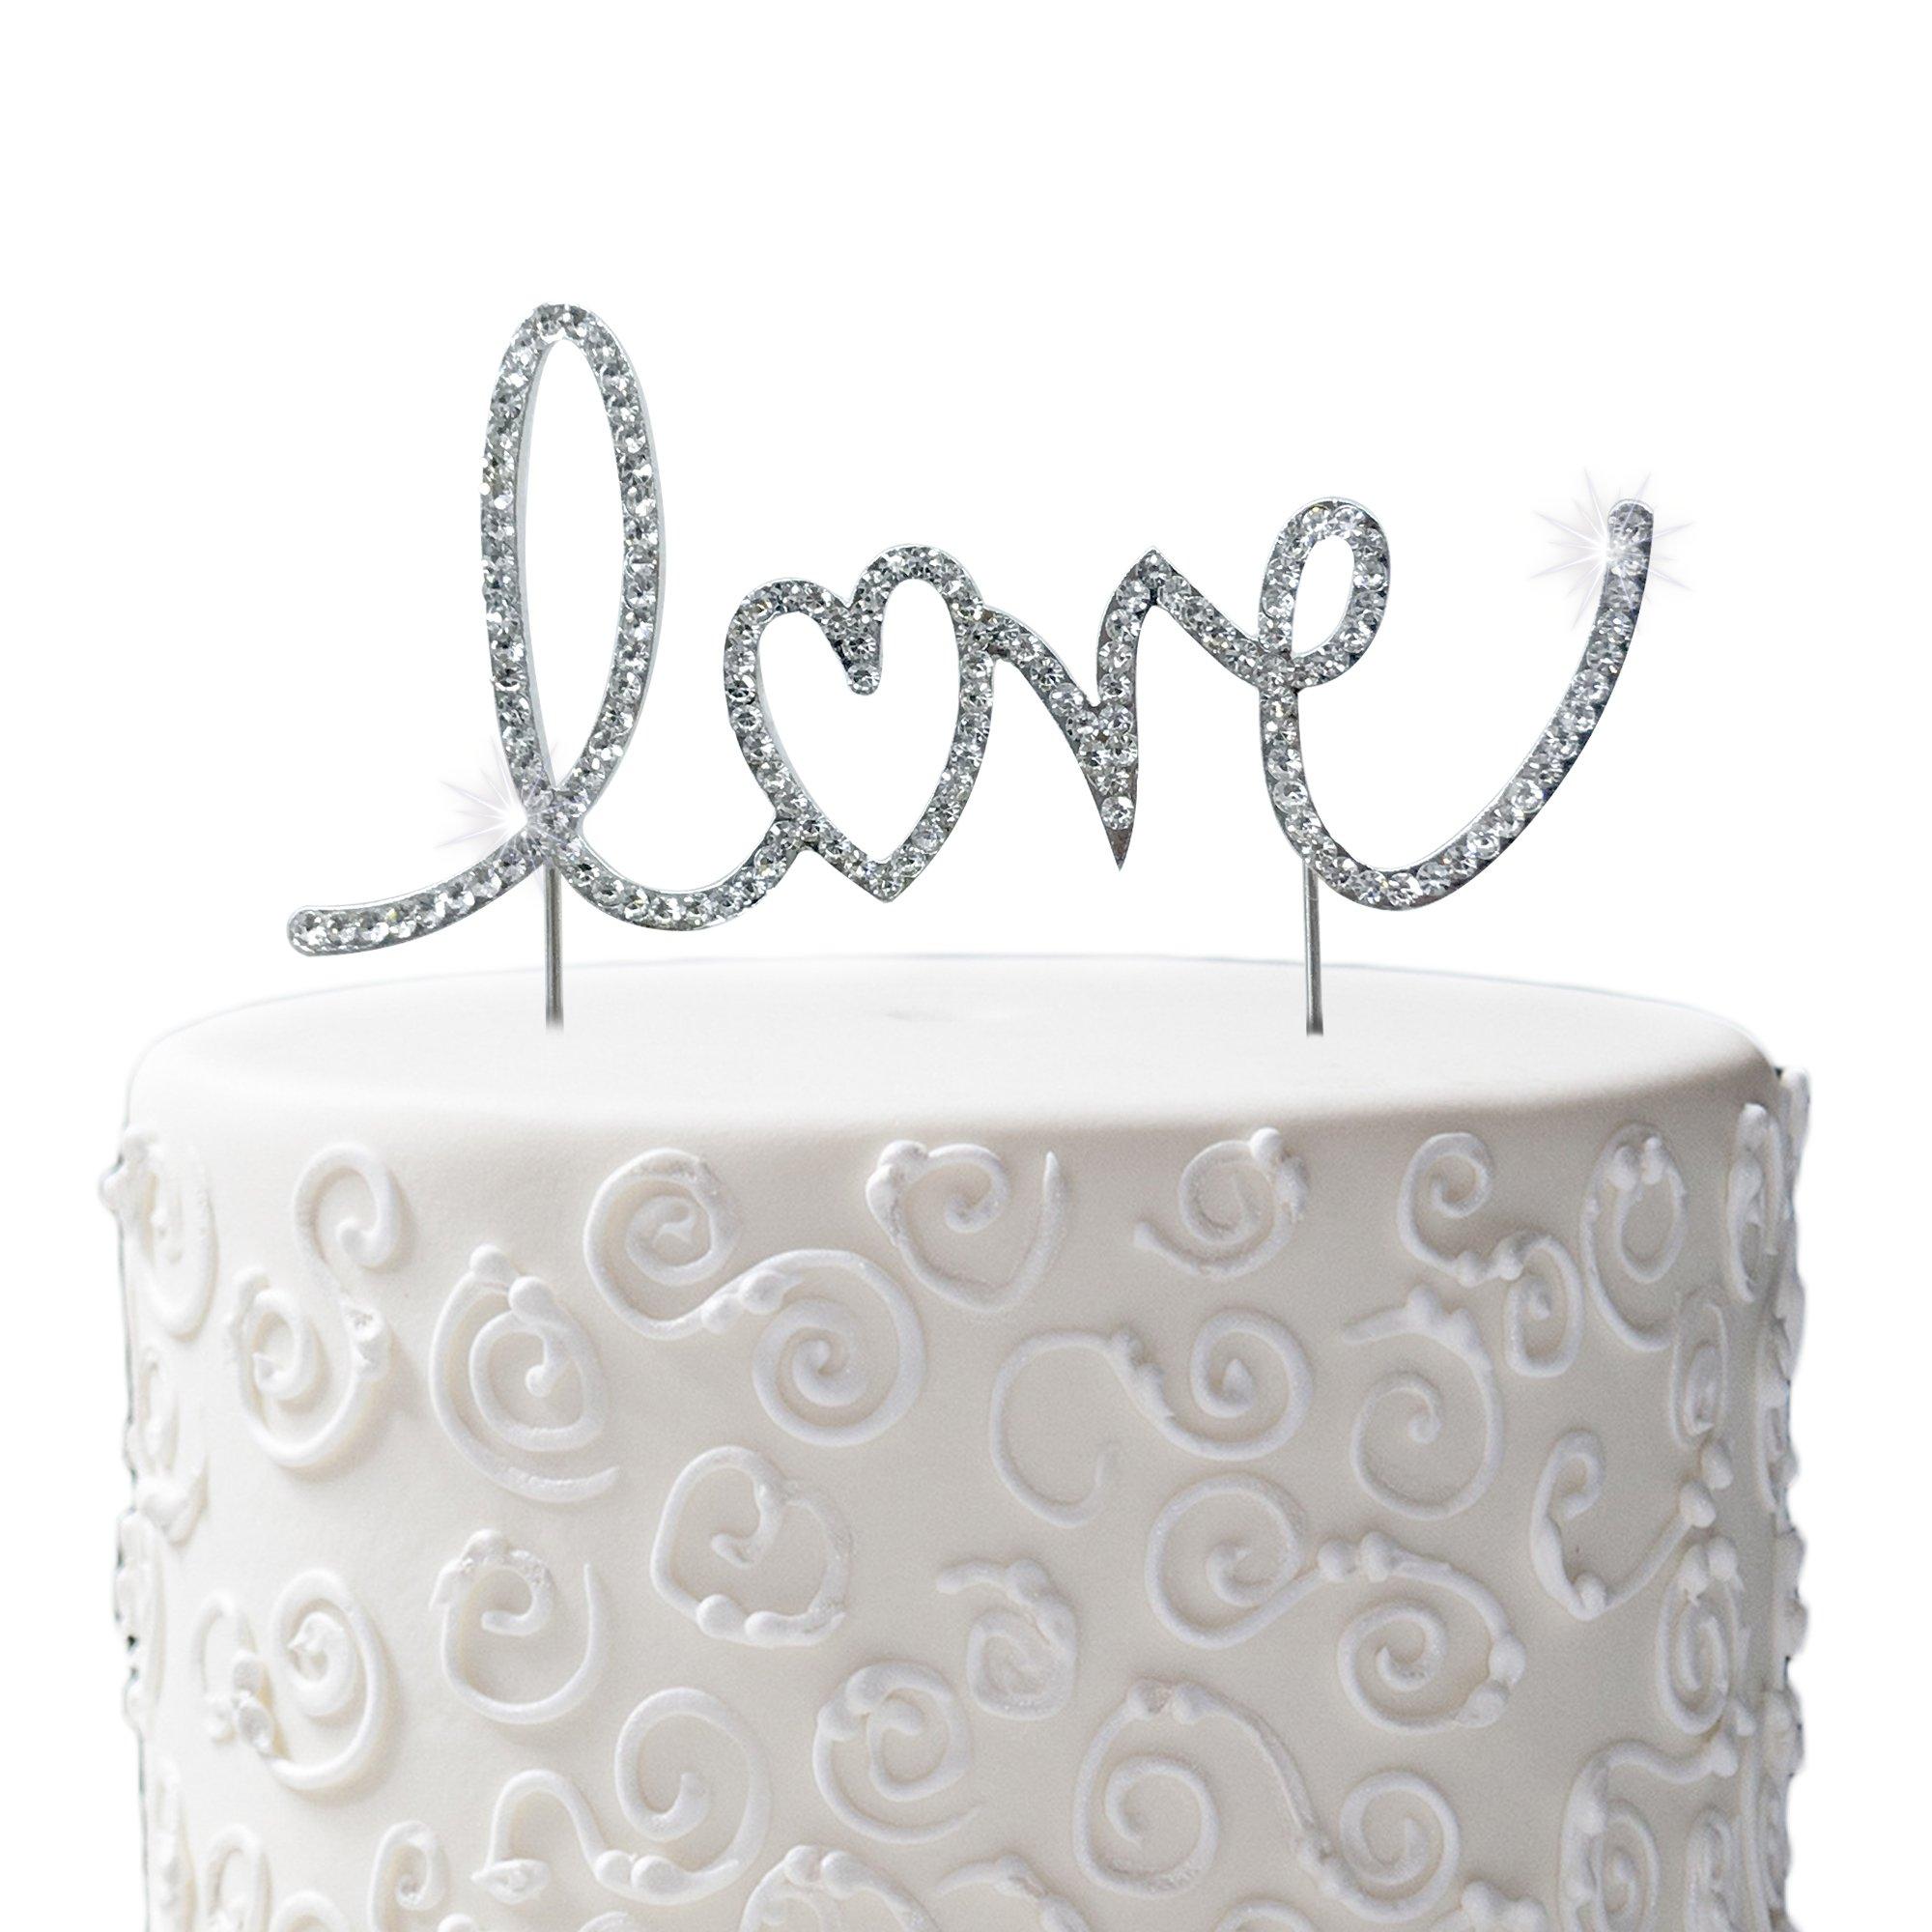 JennyGems Wedding & Anniversary Silhouette Rhinestone Letters Cake Topper - Love